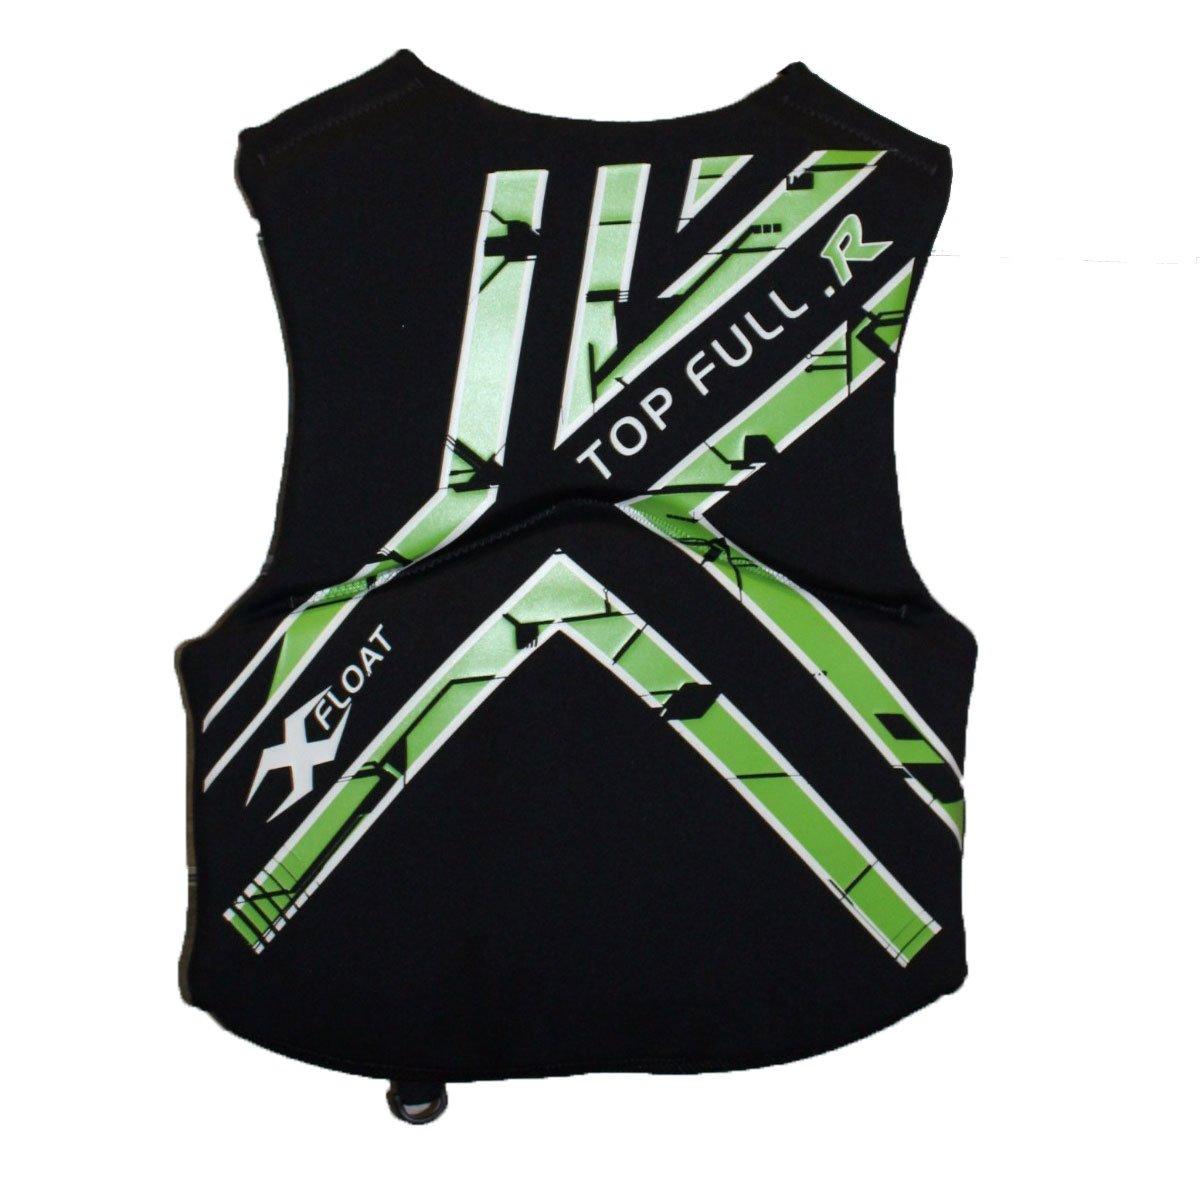 Colete Neoprene X-Float Top Full Homologado Verde